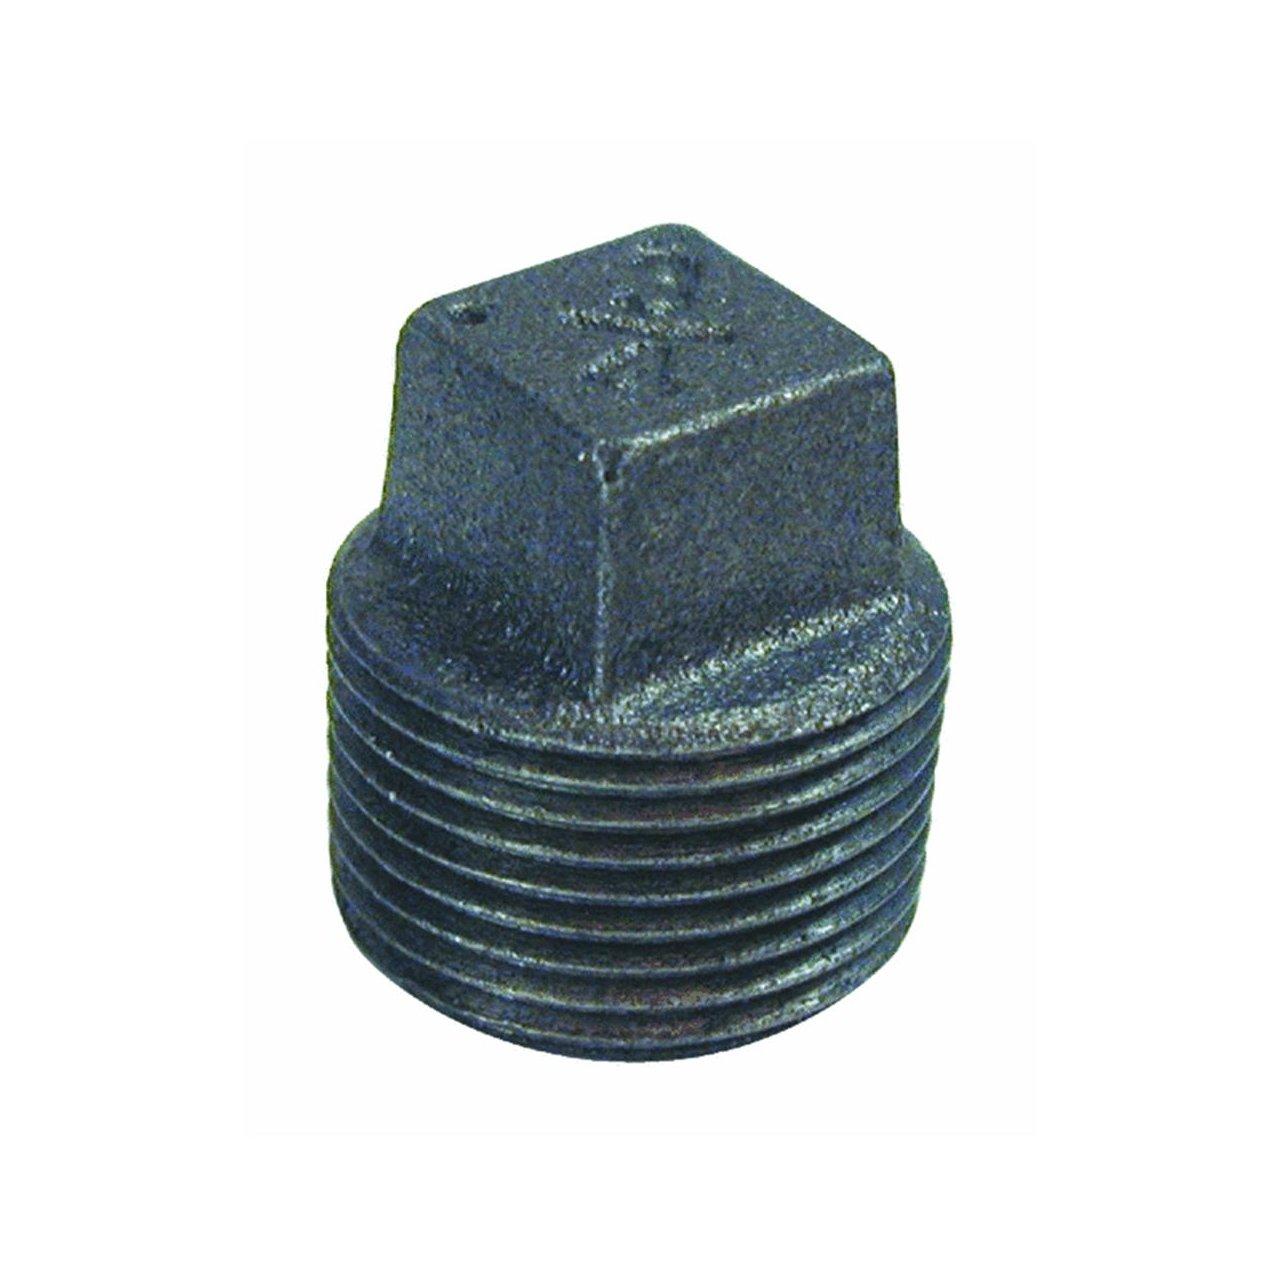 Brighton-Best International 847610 Hex Medium-Strength Grade 5 Head Screw Steel 7//8-9 Thread Size 9 Long Pack of 10 External Hex 7//8-9 Thread Size Pack of 10 9 Long